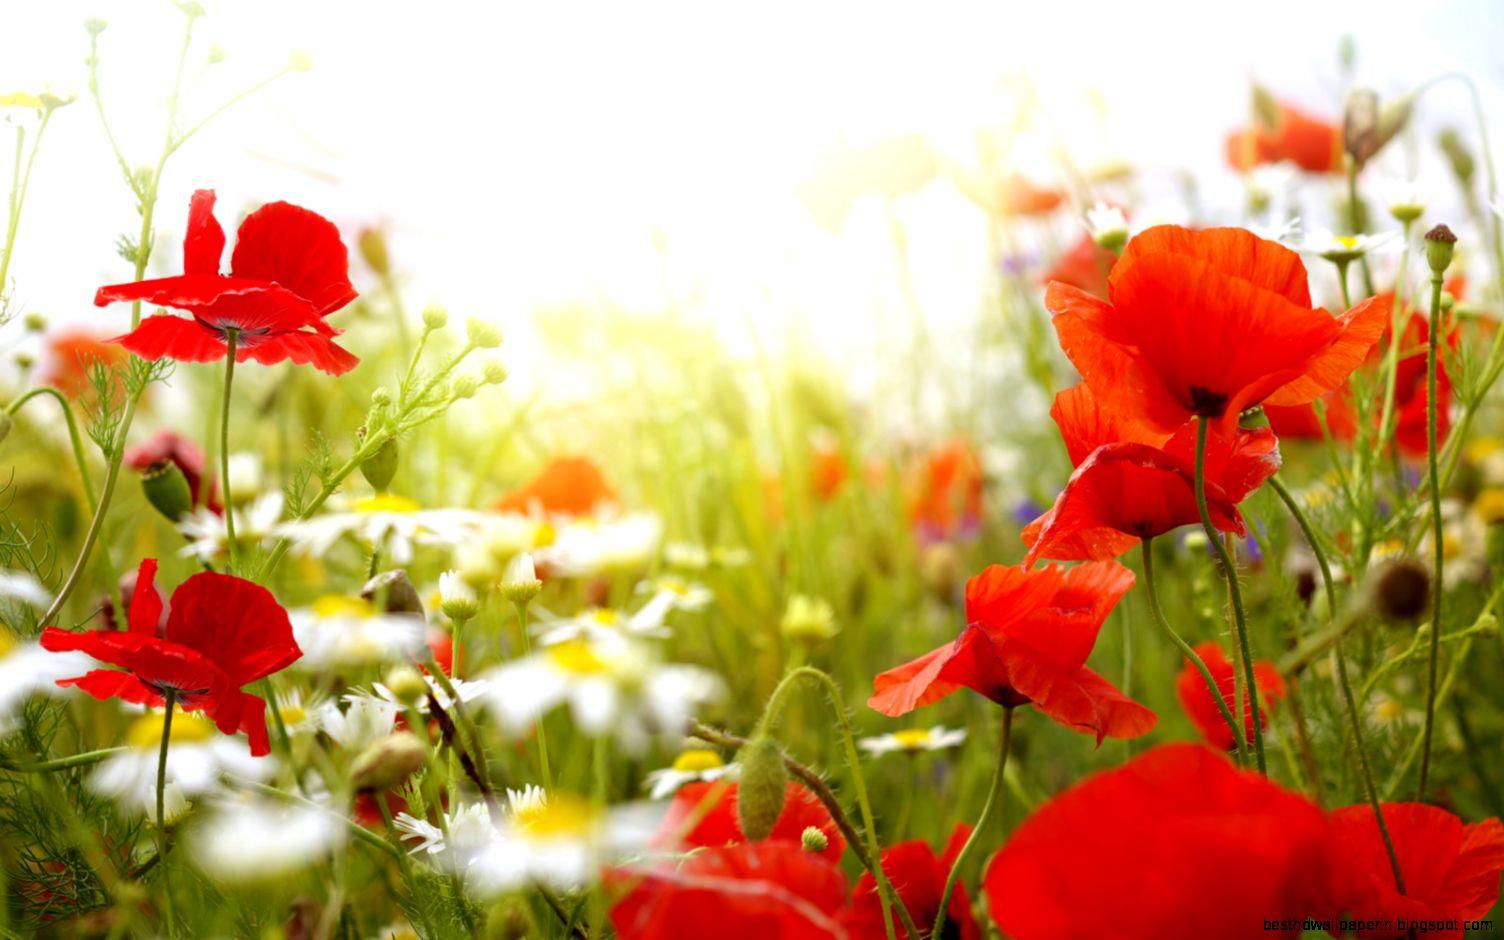 Springtime flowers desktop background best hd wallpapers view original size spring flowers backgrounds mightylinksfo